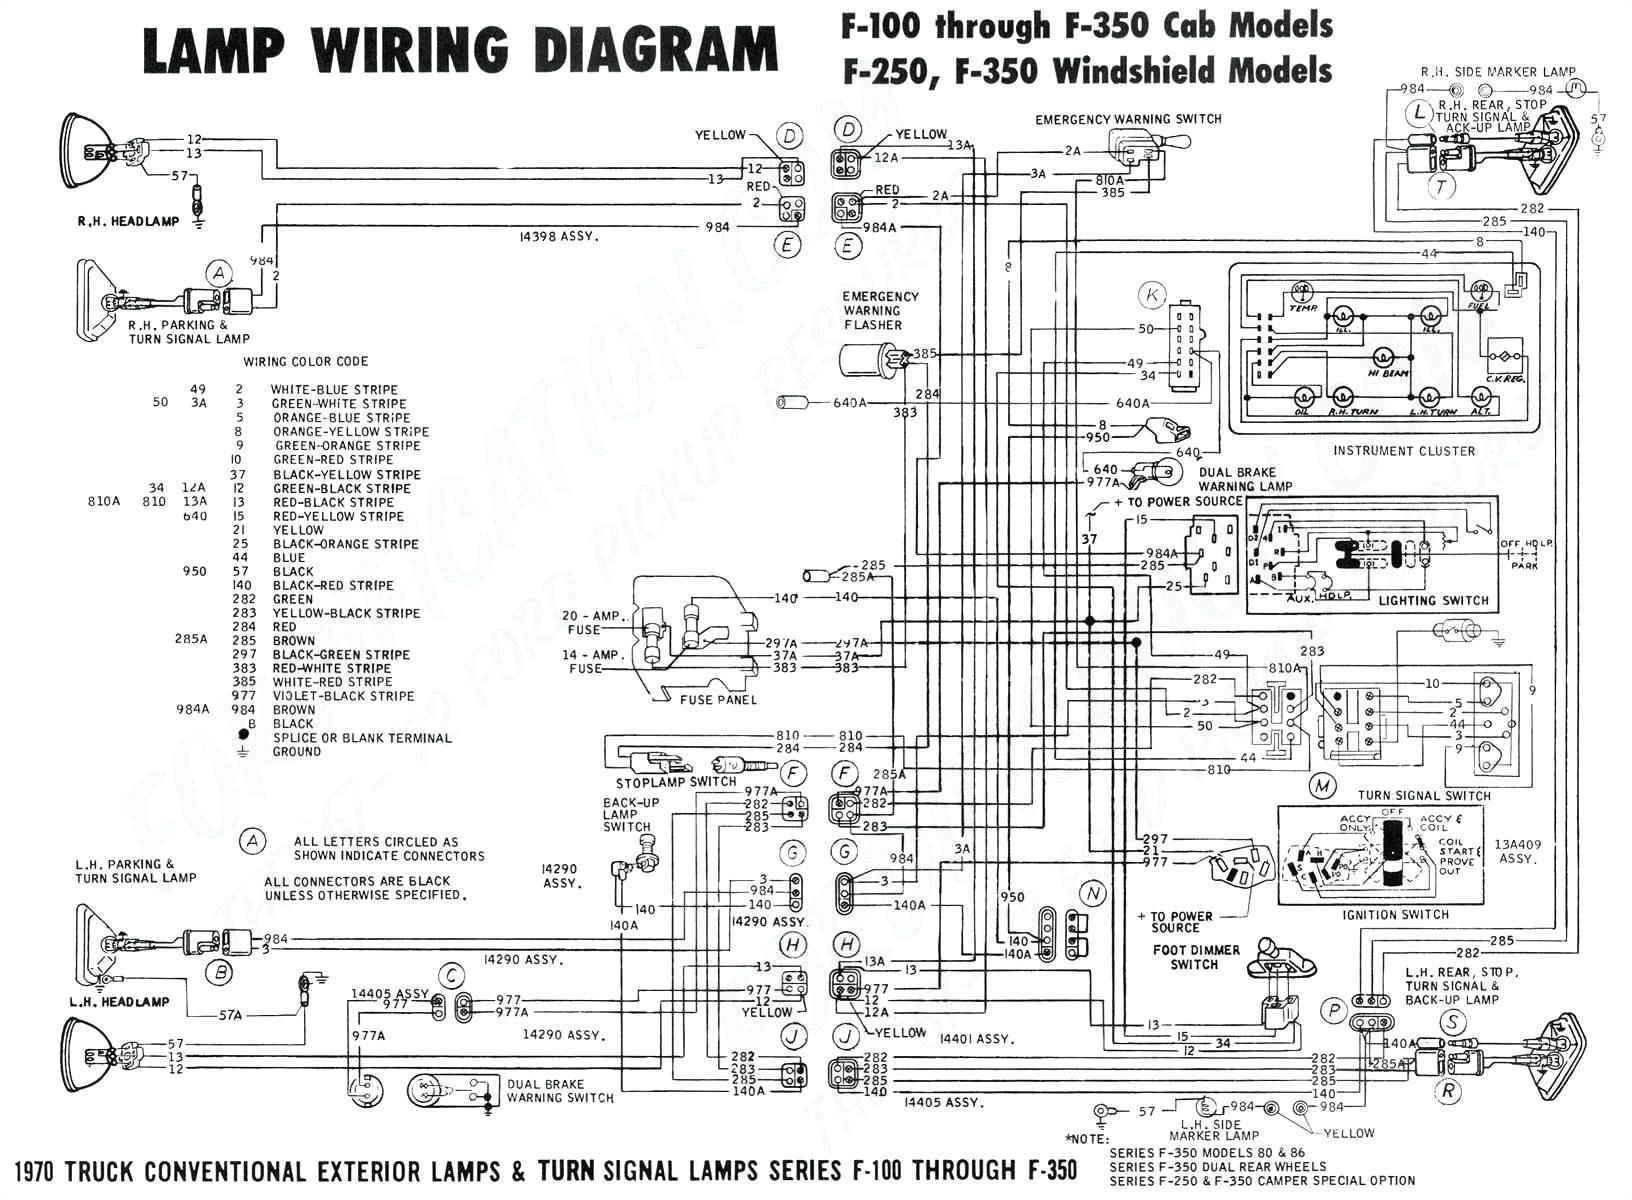 briggs magneto wiring diagram wiring diagram new briggs and stratton engine diagram magneto ignition system wiring